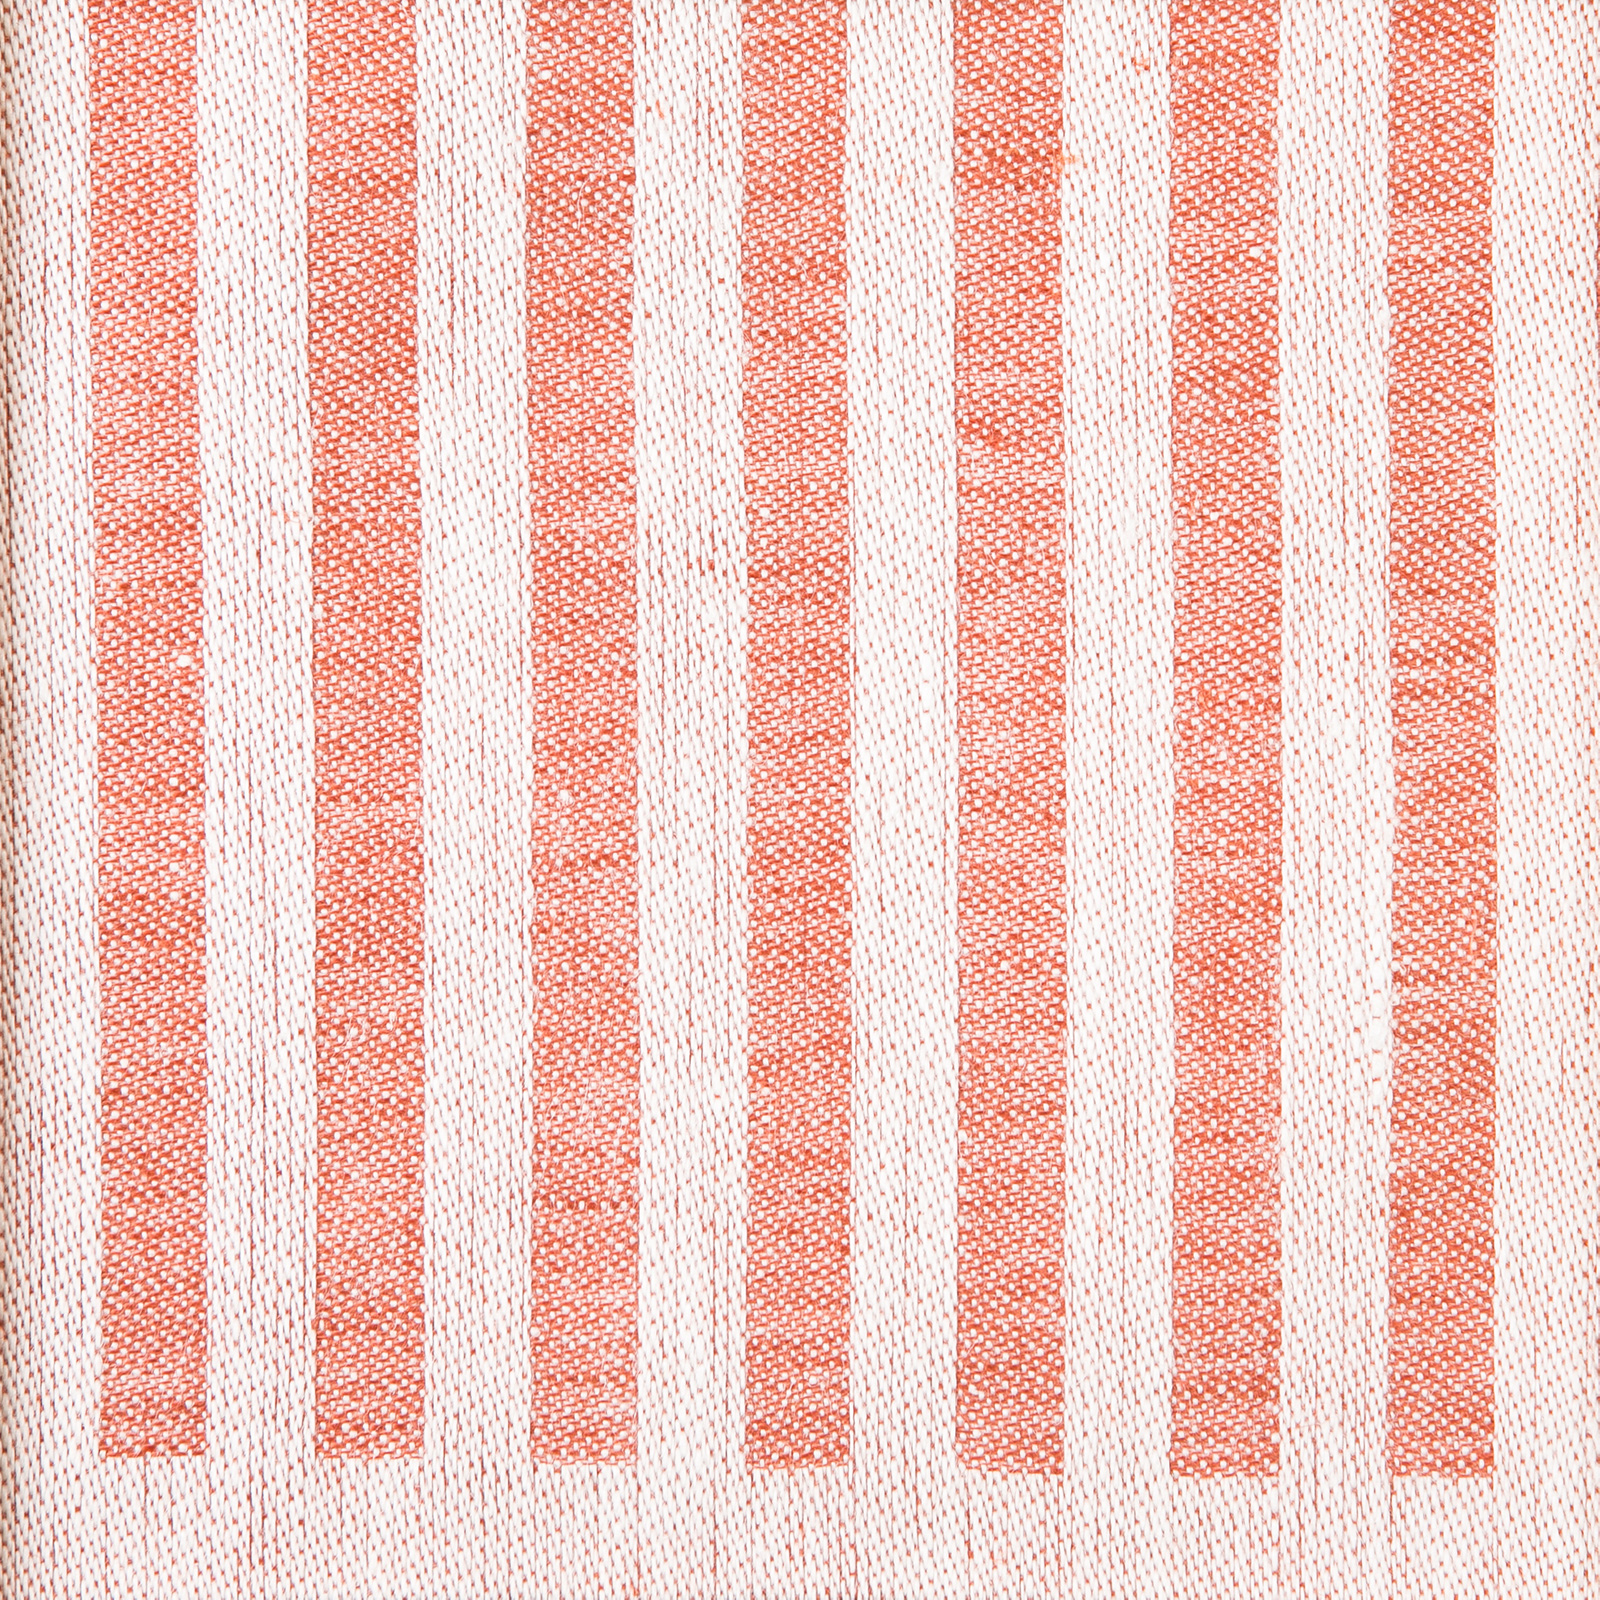 Anne färgprov design Hanne Vedel färg tegelröd